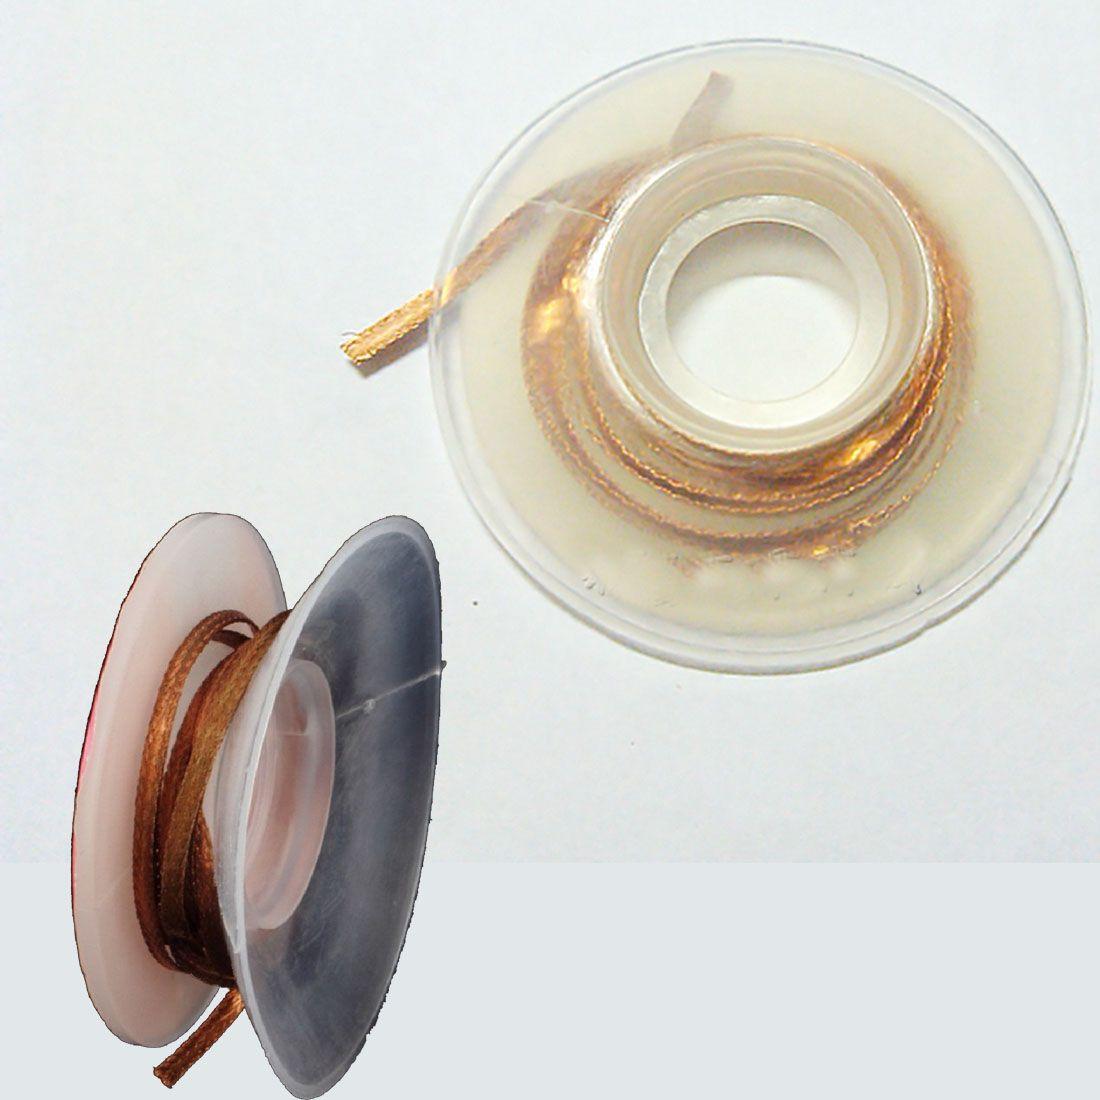 Hot Solder high quality Wick 1.5M 2.0mm Desoldering Braid Solder Remover Wick Pure Oxygen-free Copper Wire Solder Accessories